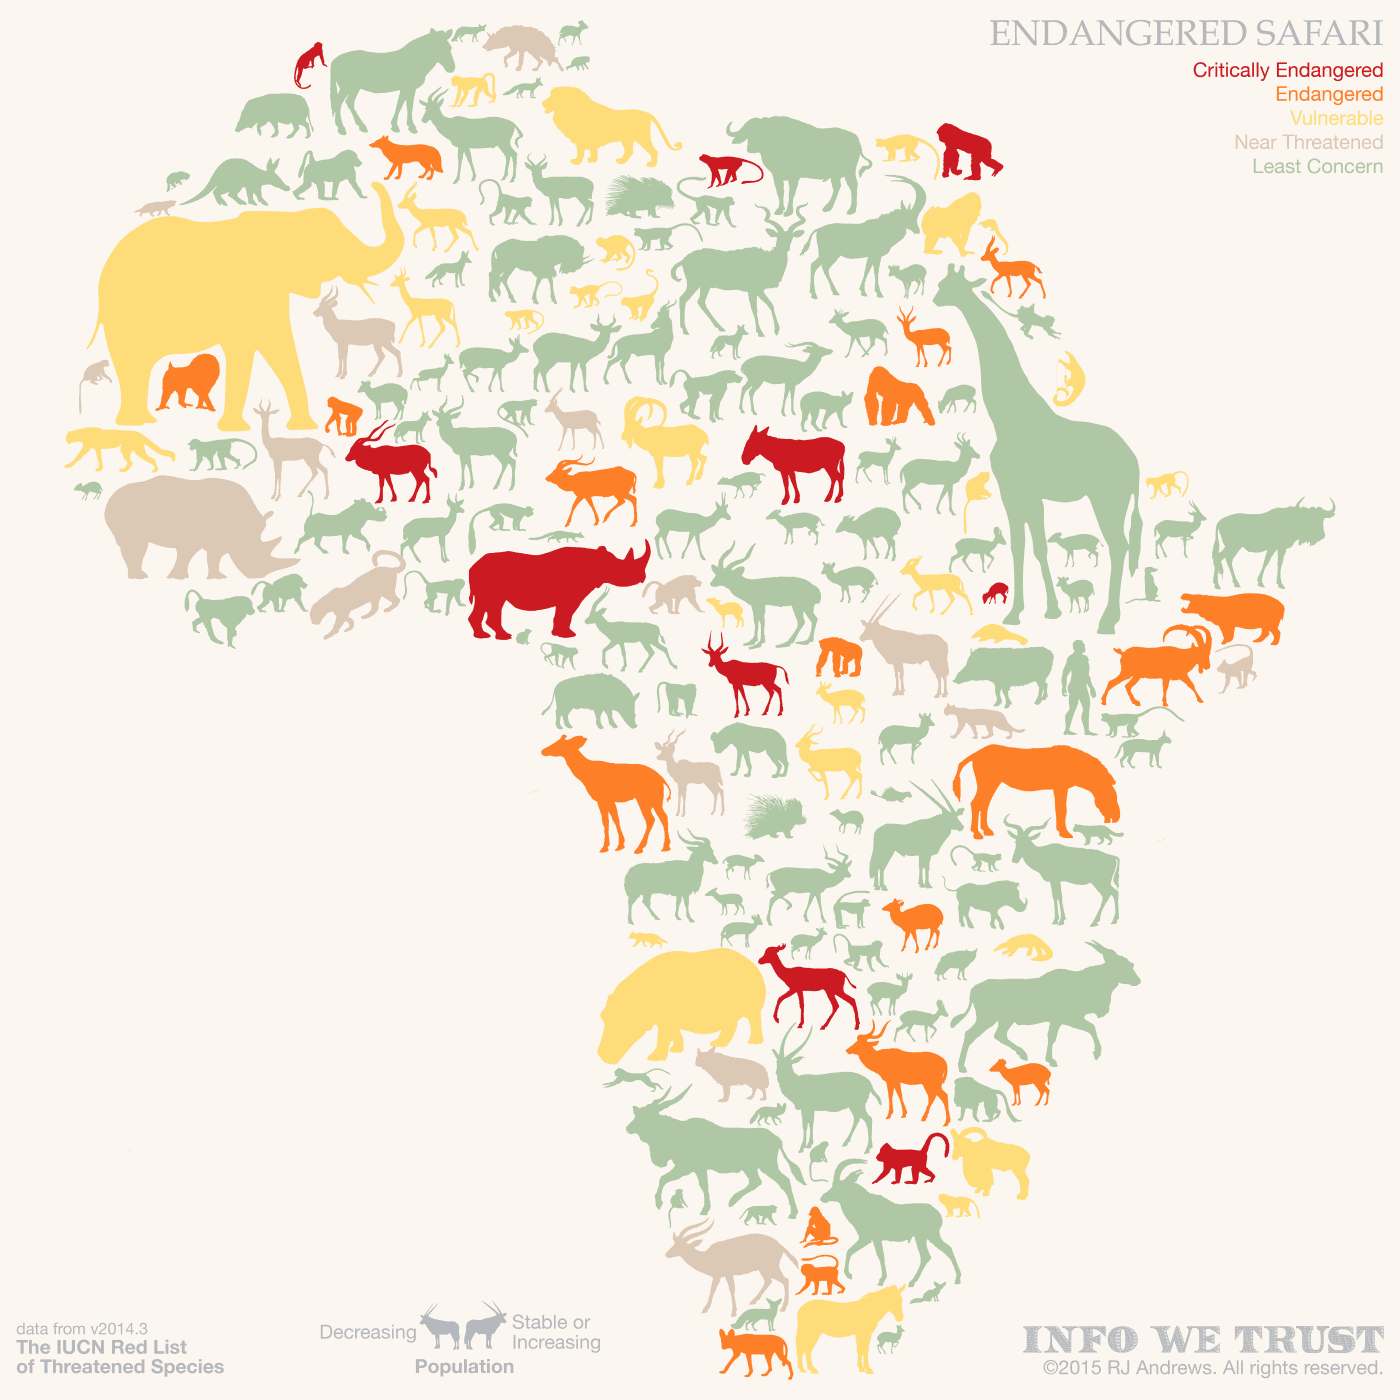 Endagered Safari